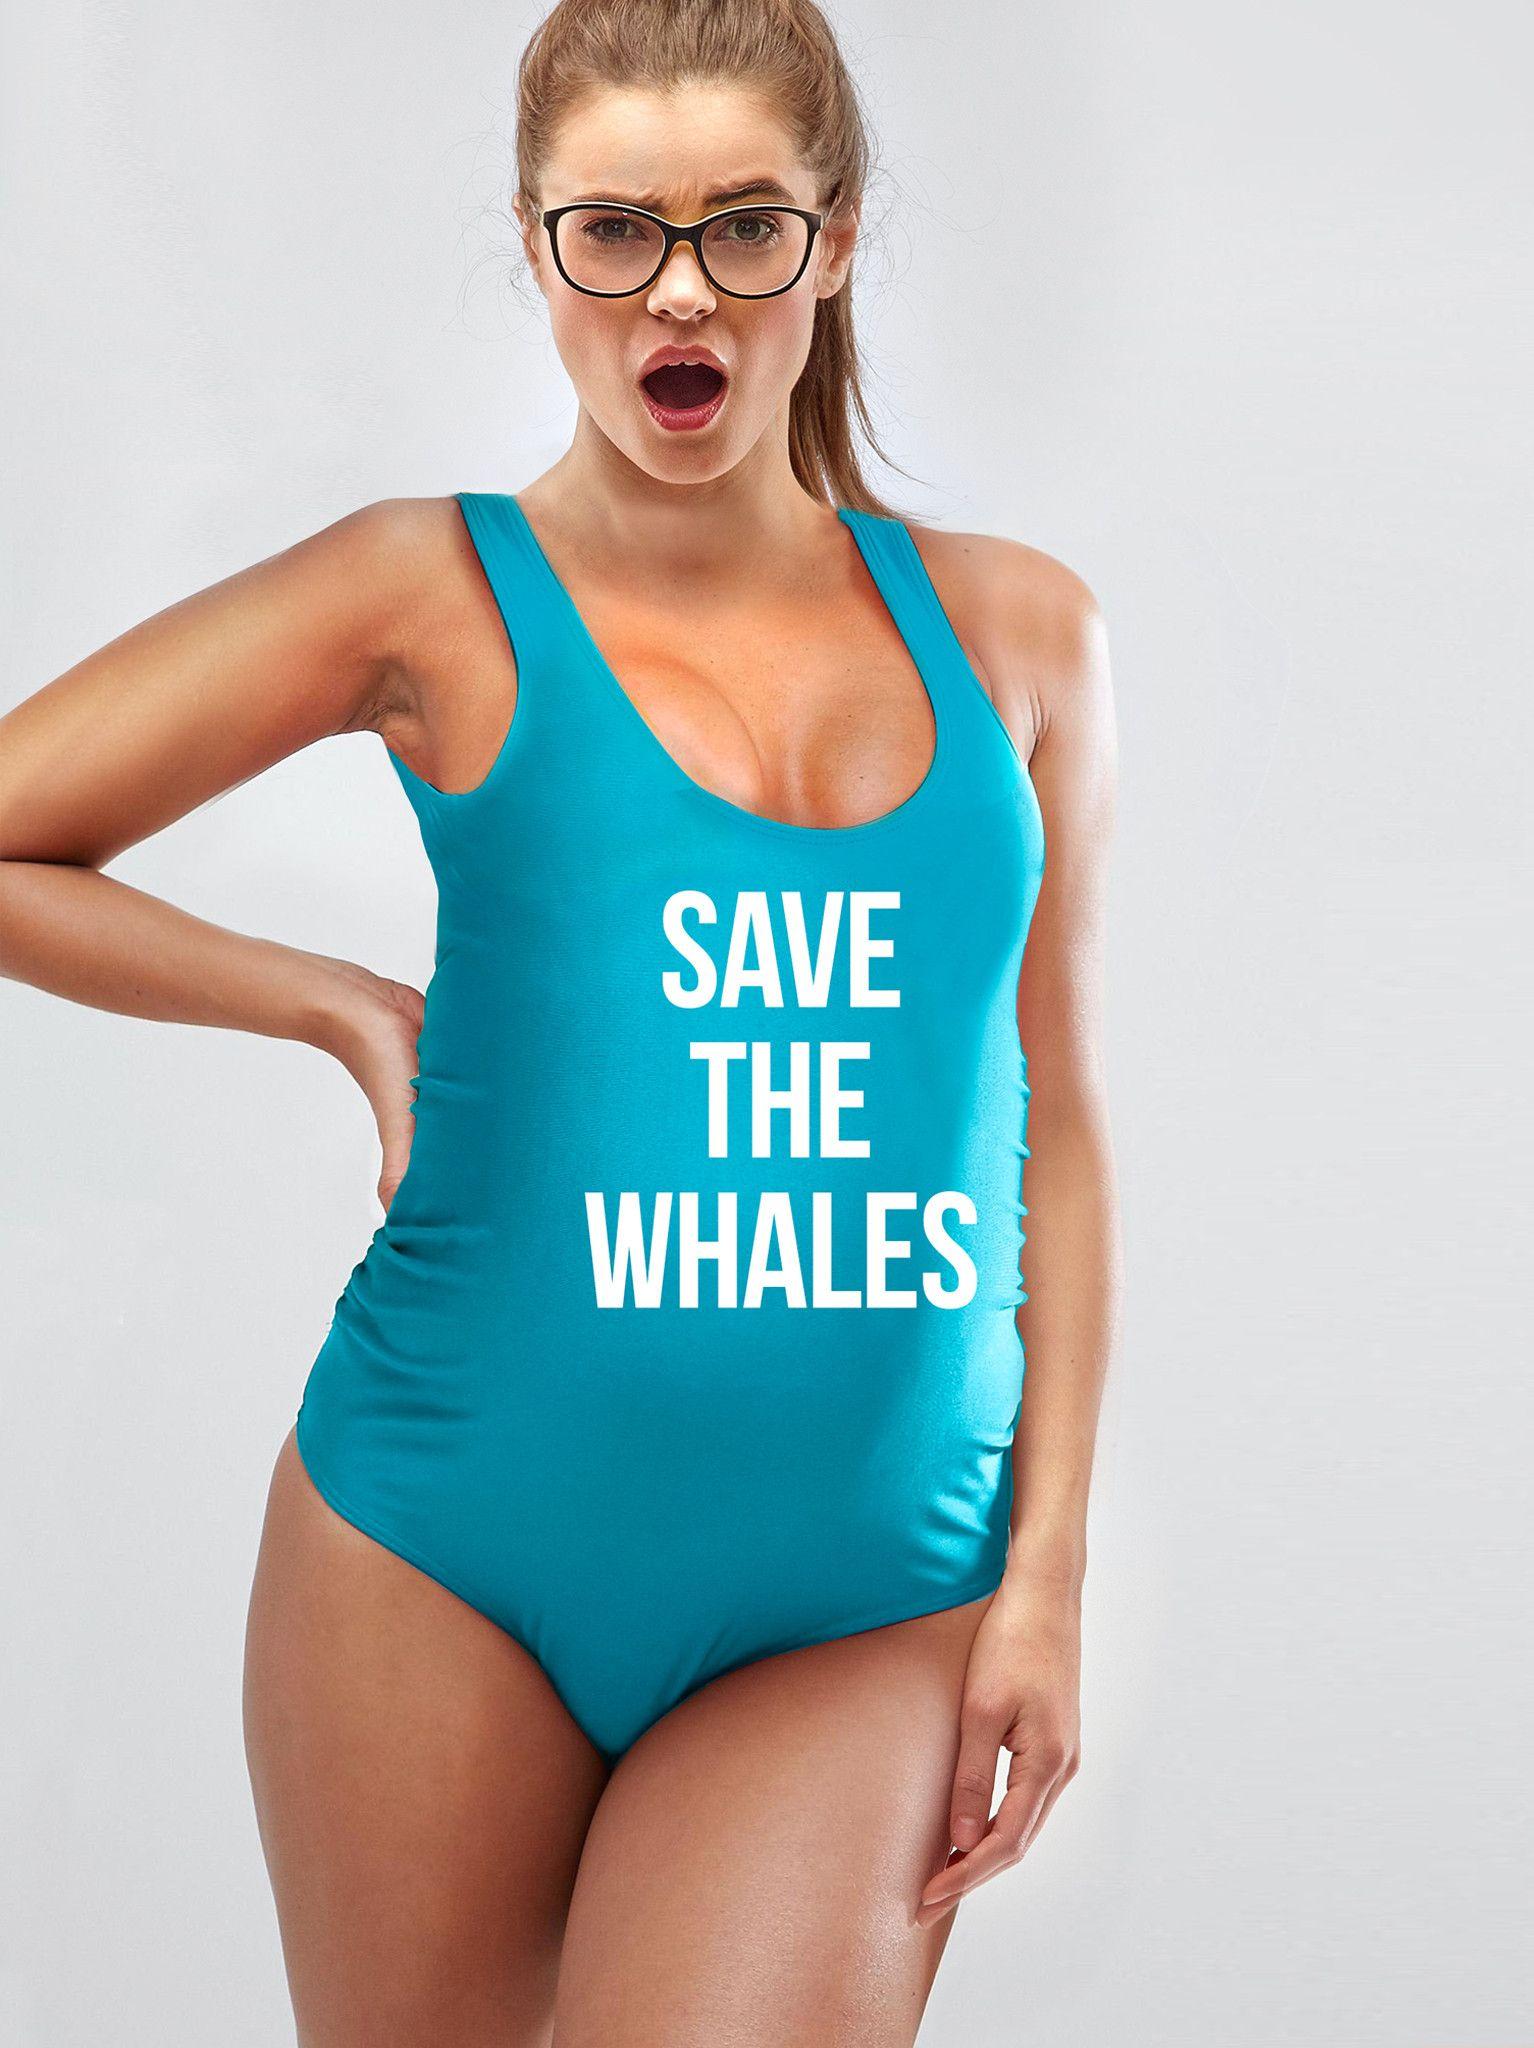 6b2cd42ec42 Save the Whales Maternity Swimwear | Pregnancy style | Maternity ...